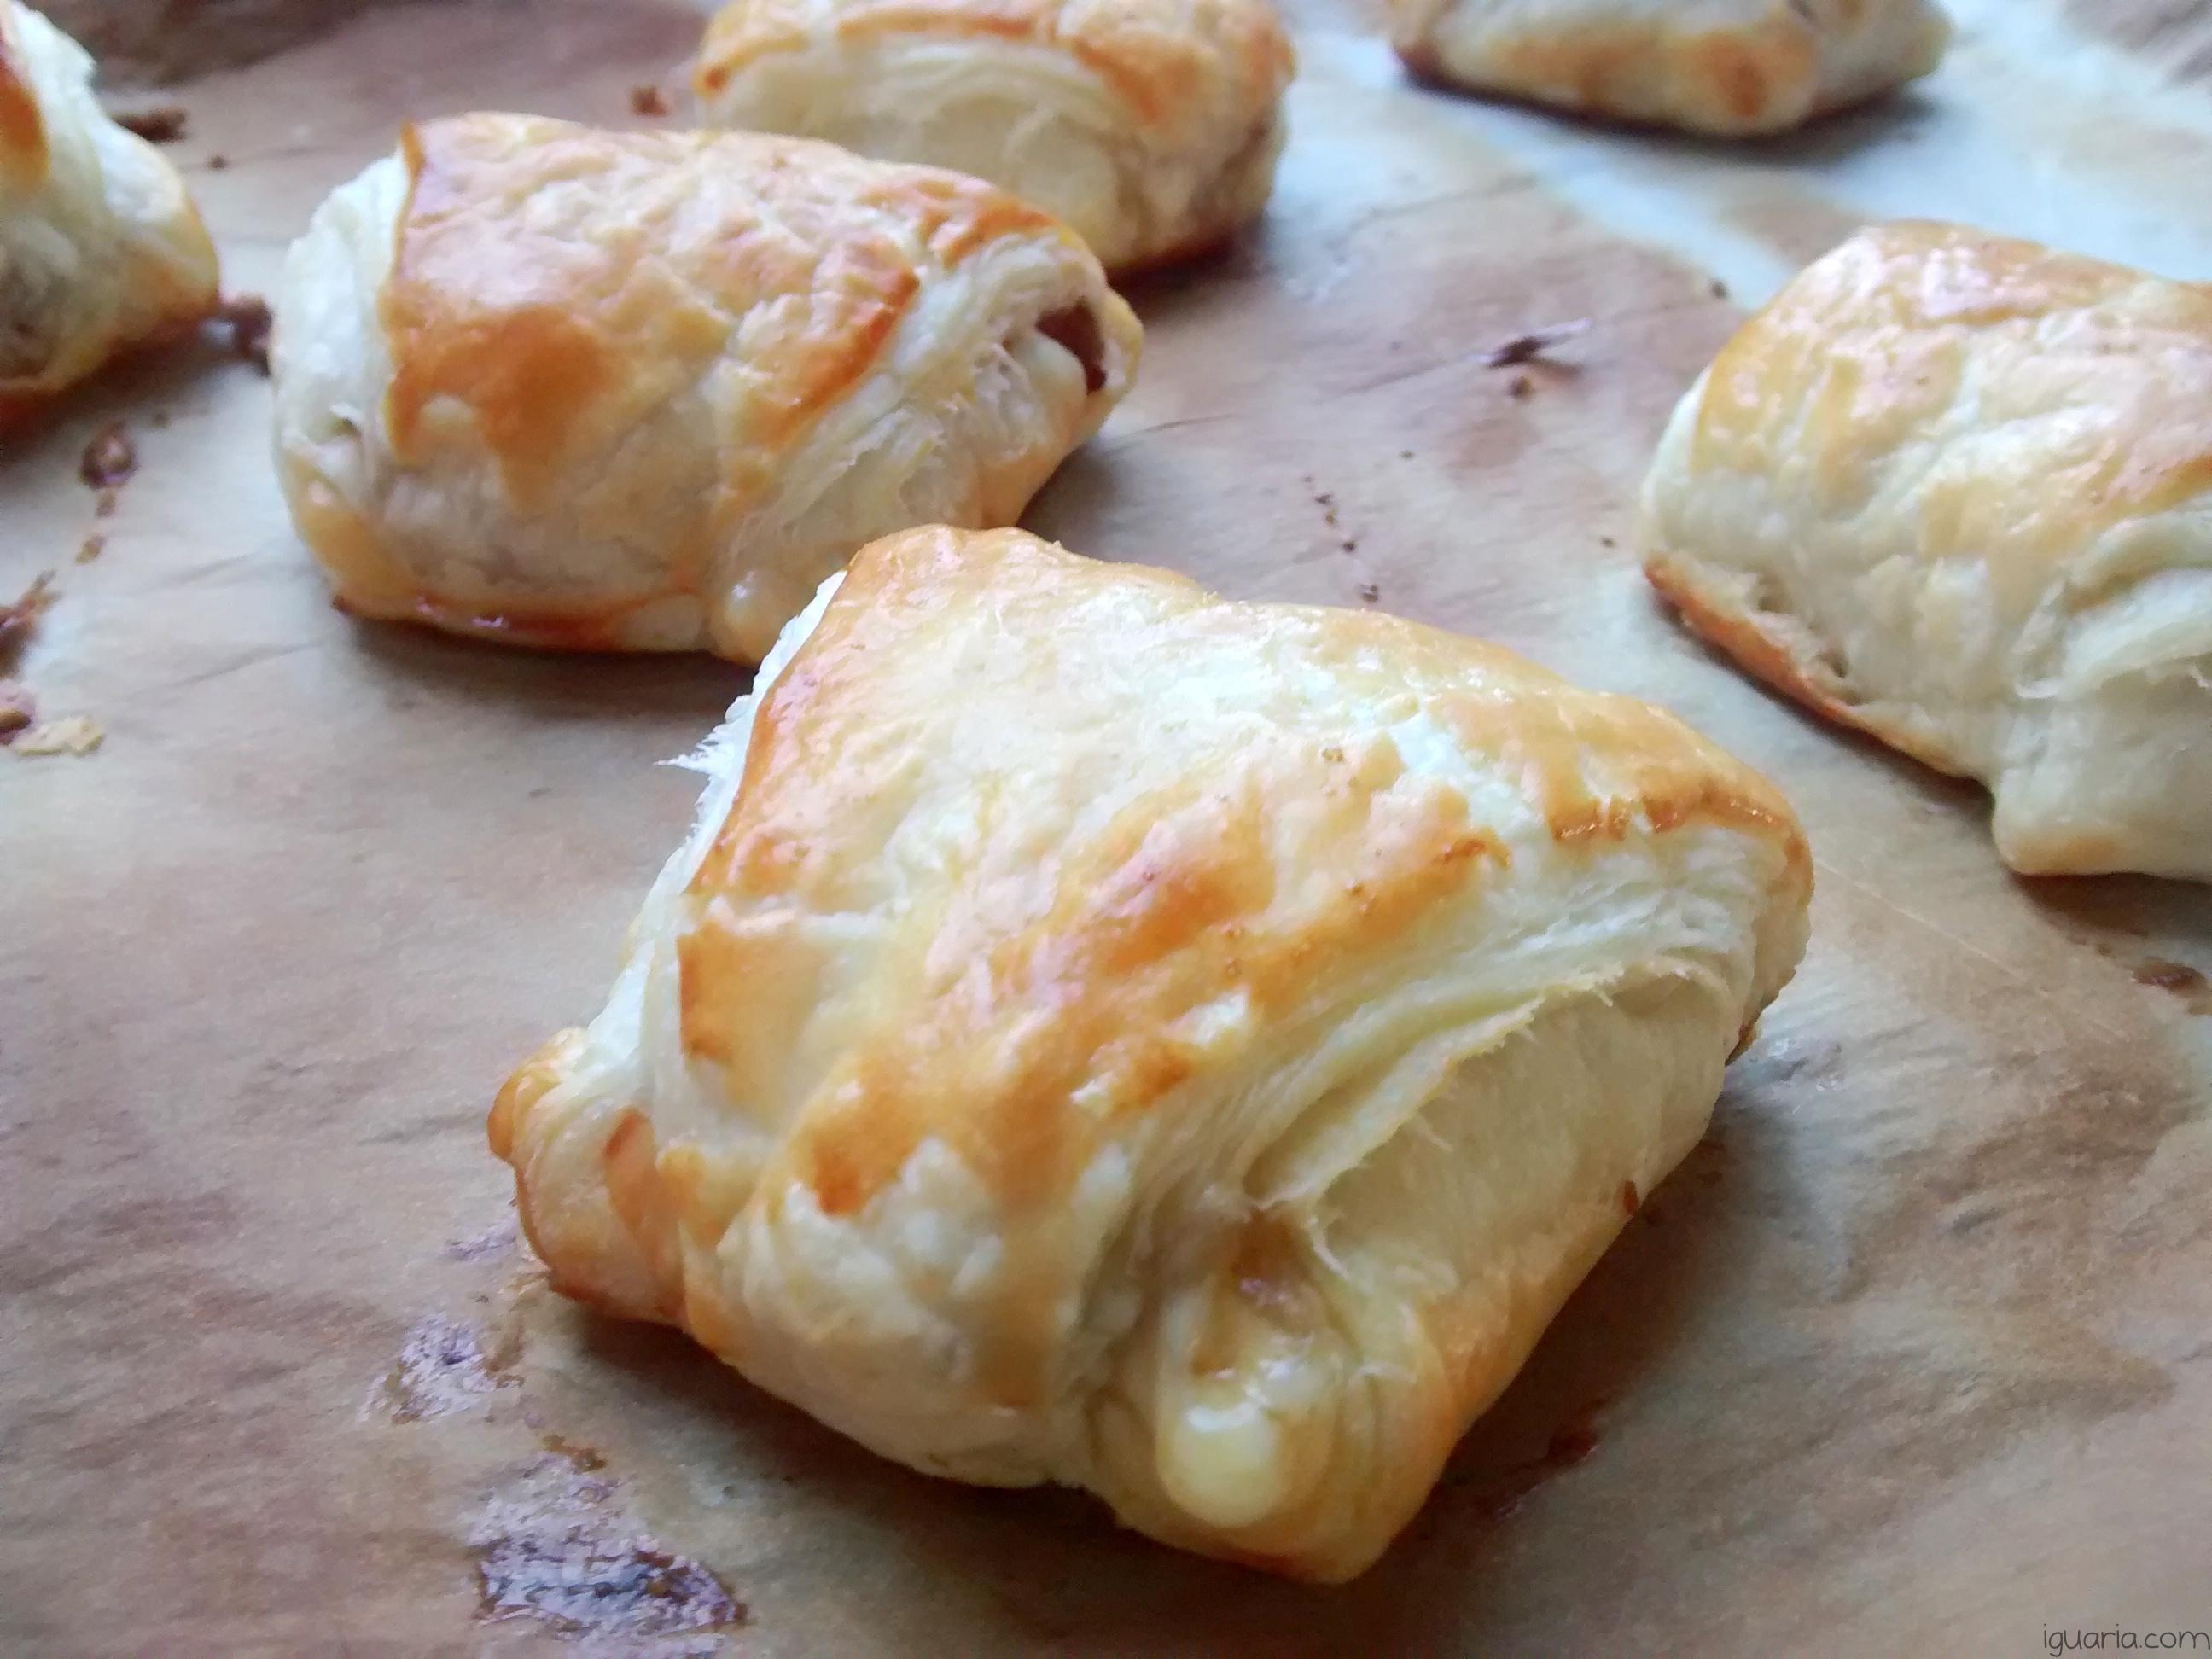 Iguaria_Pasteis-de-Bacon-Cozinhados